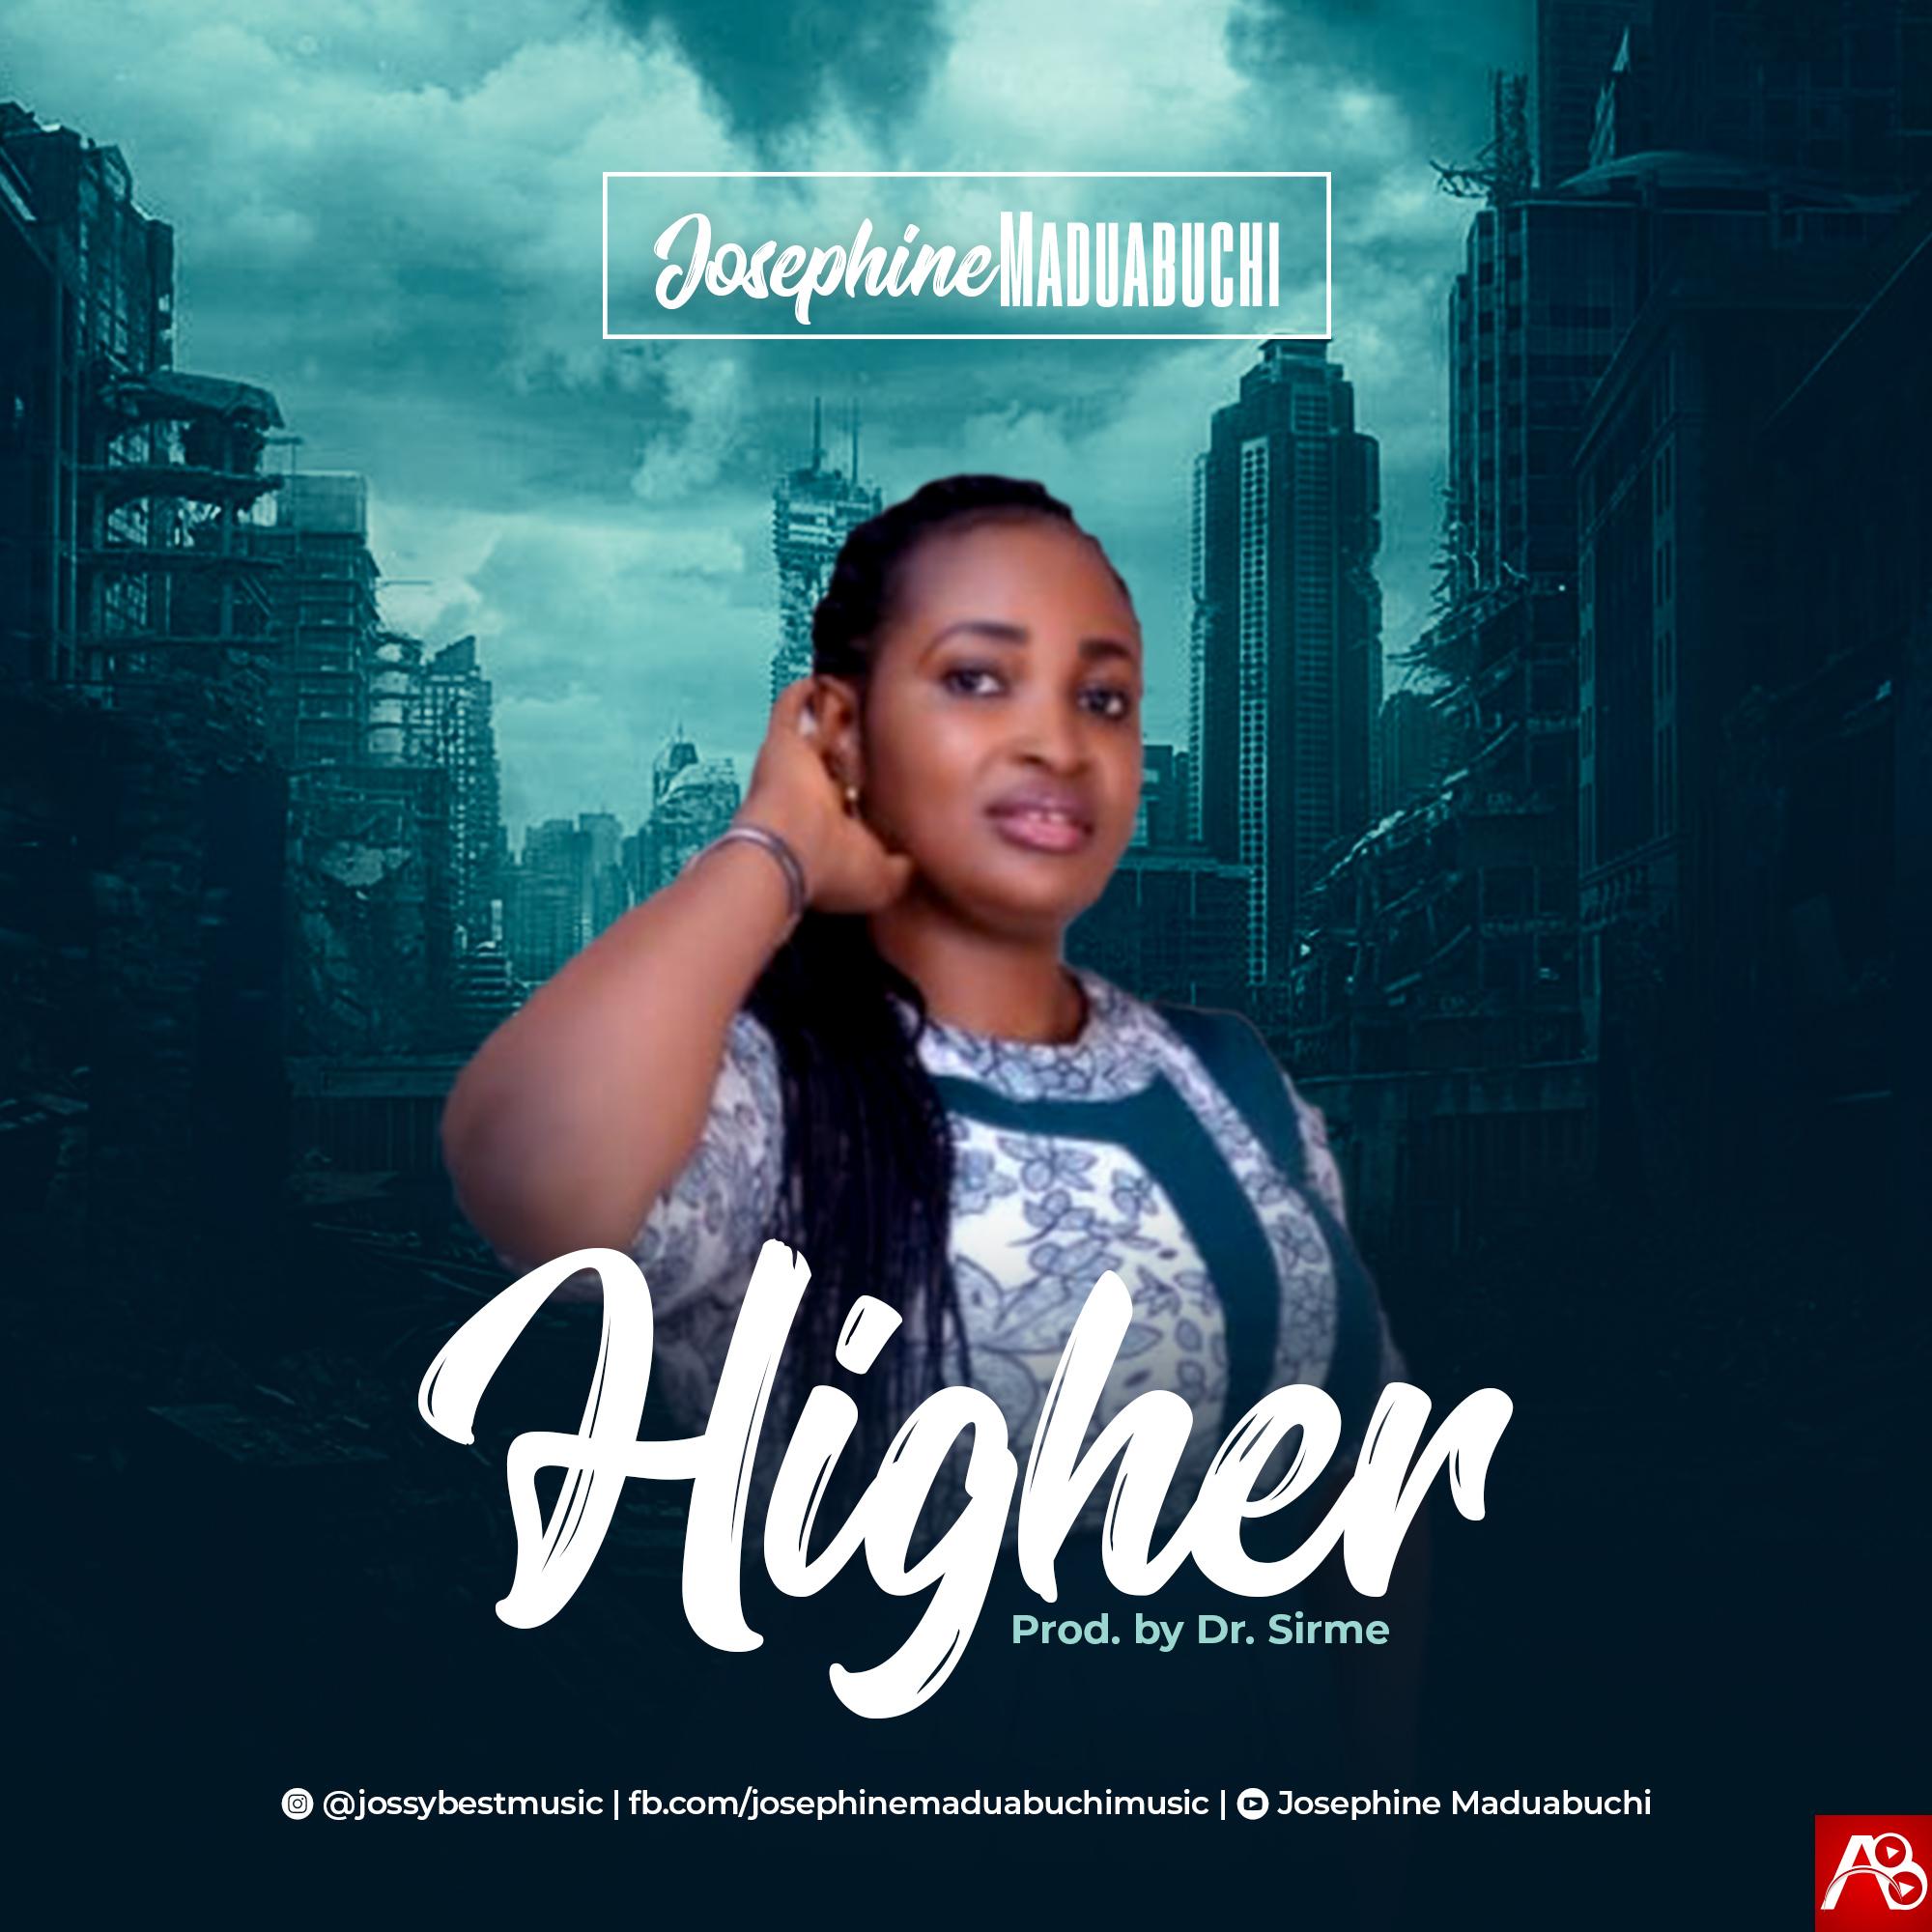 Josephine Maduabuchi Higher